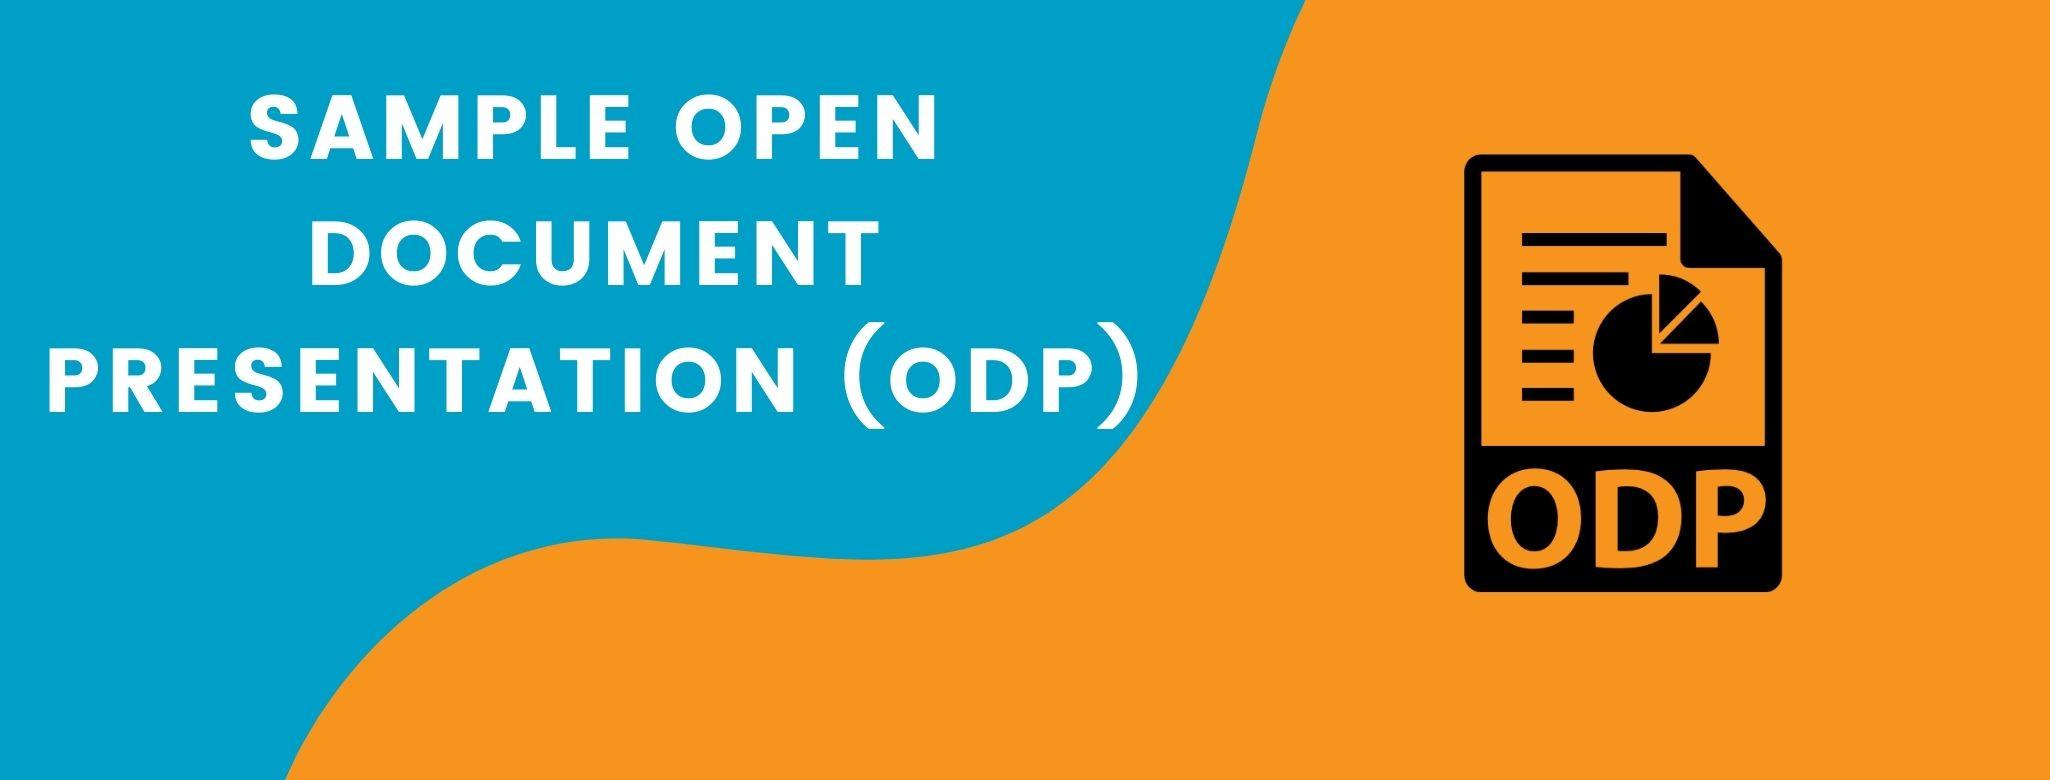 Sample Open Document Presentation